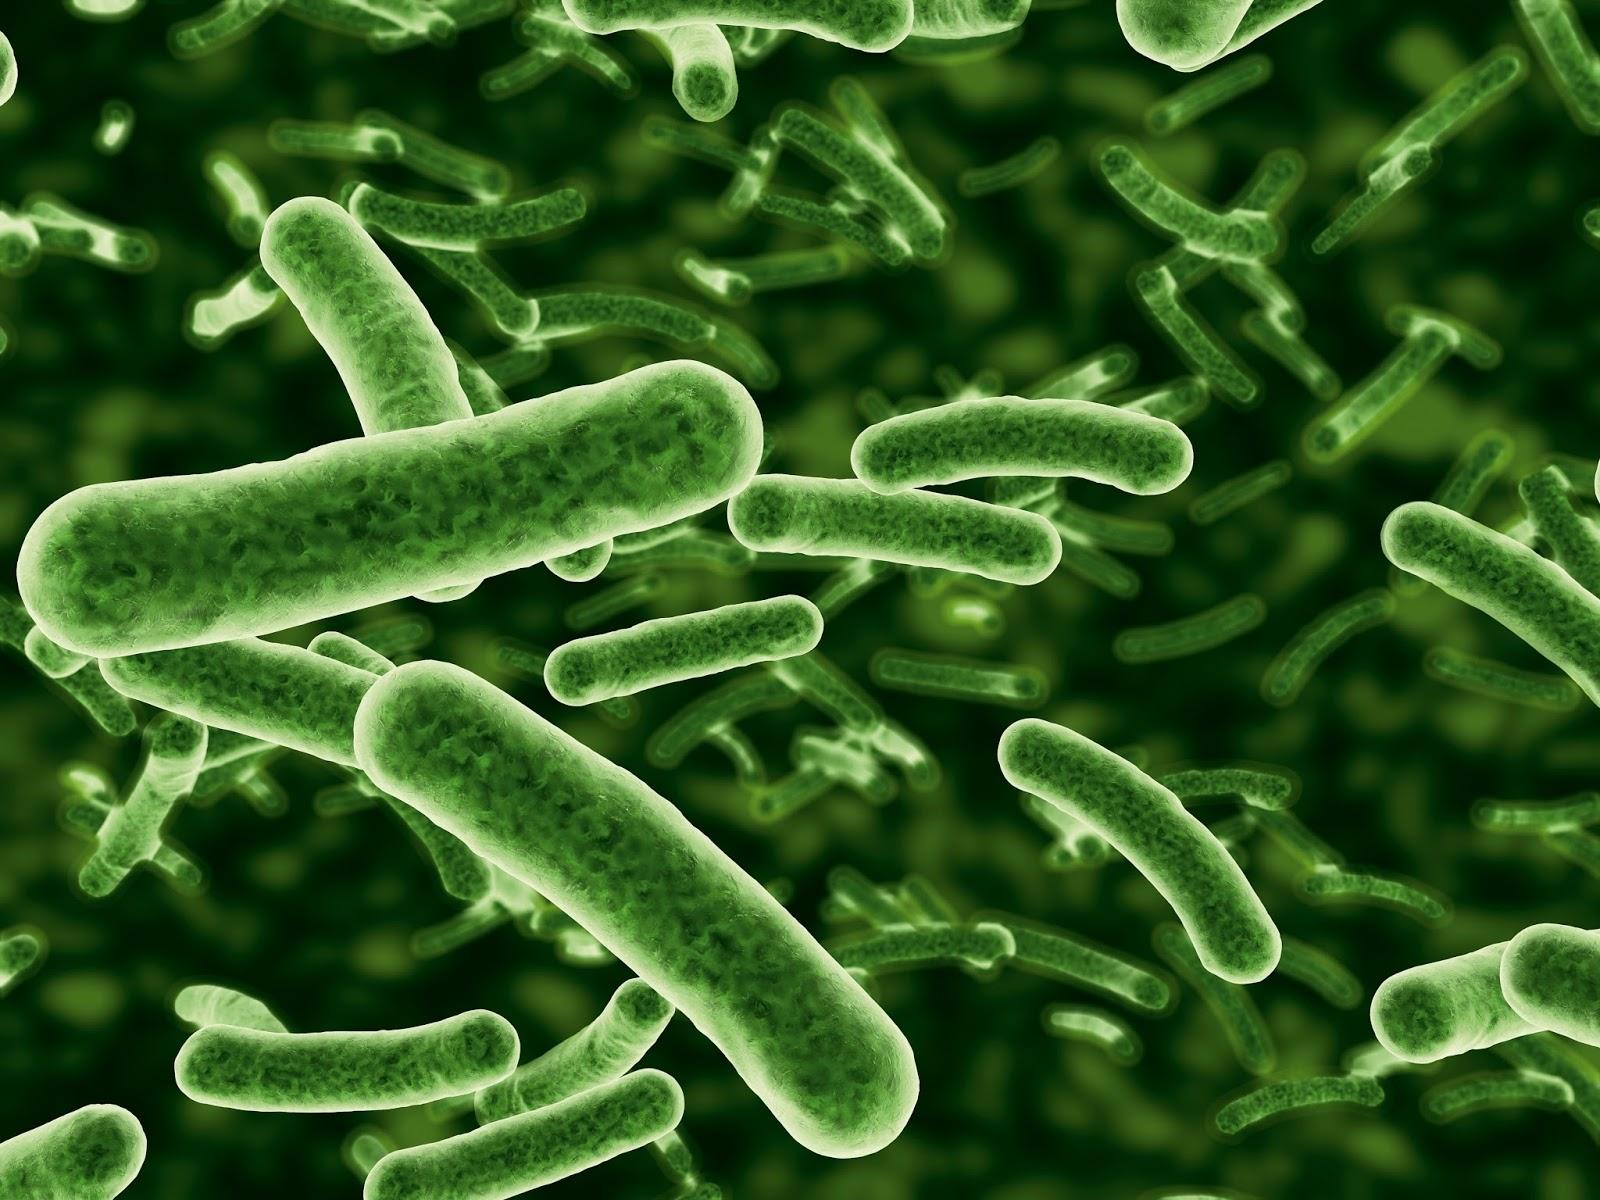 bacterii regn